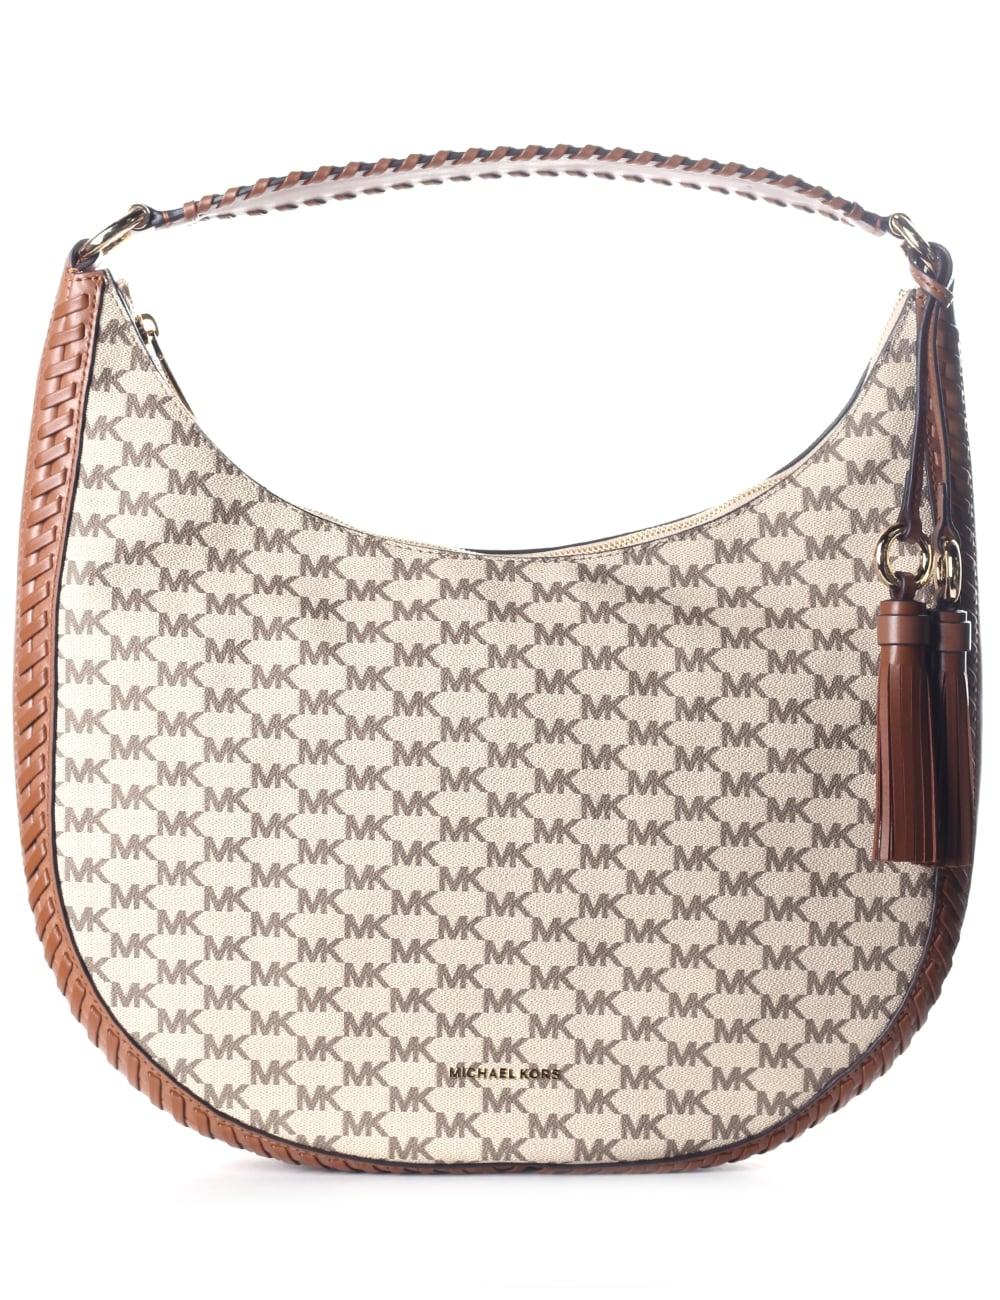 ecdde83126fe Michael Kors Women's Large Lauryn Shoulder Bag Natural/Luggage